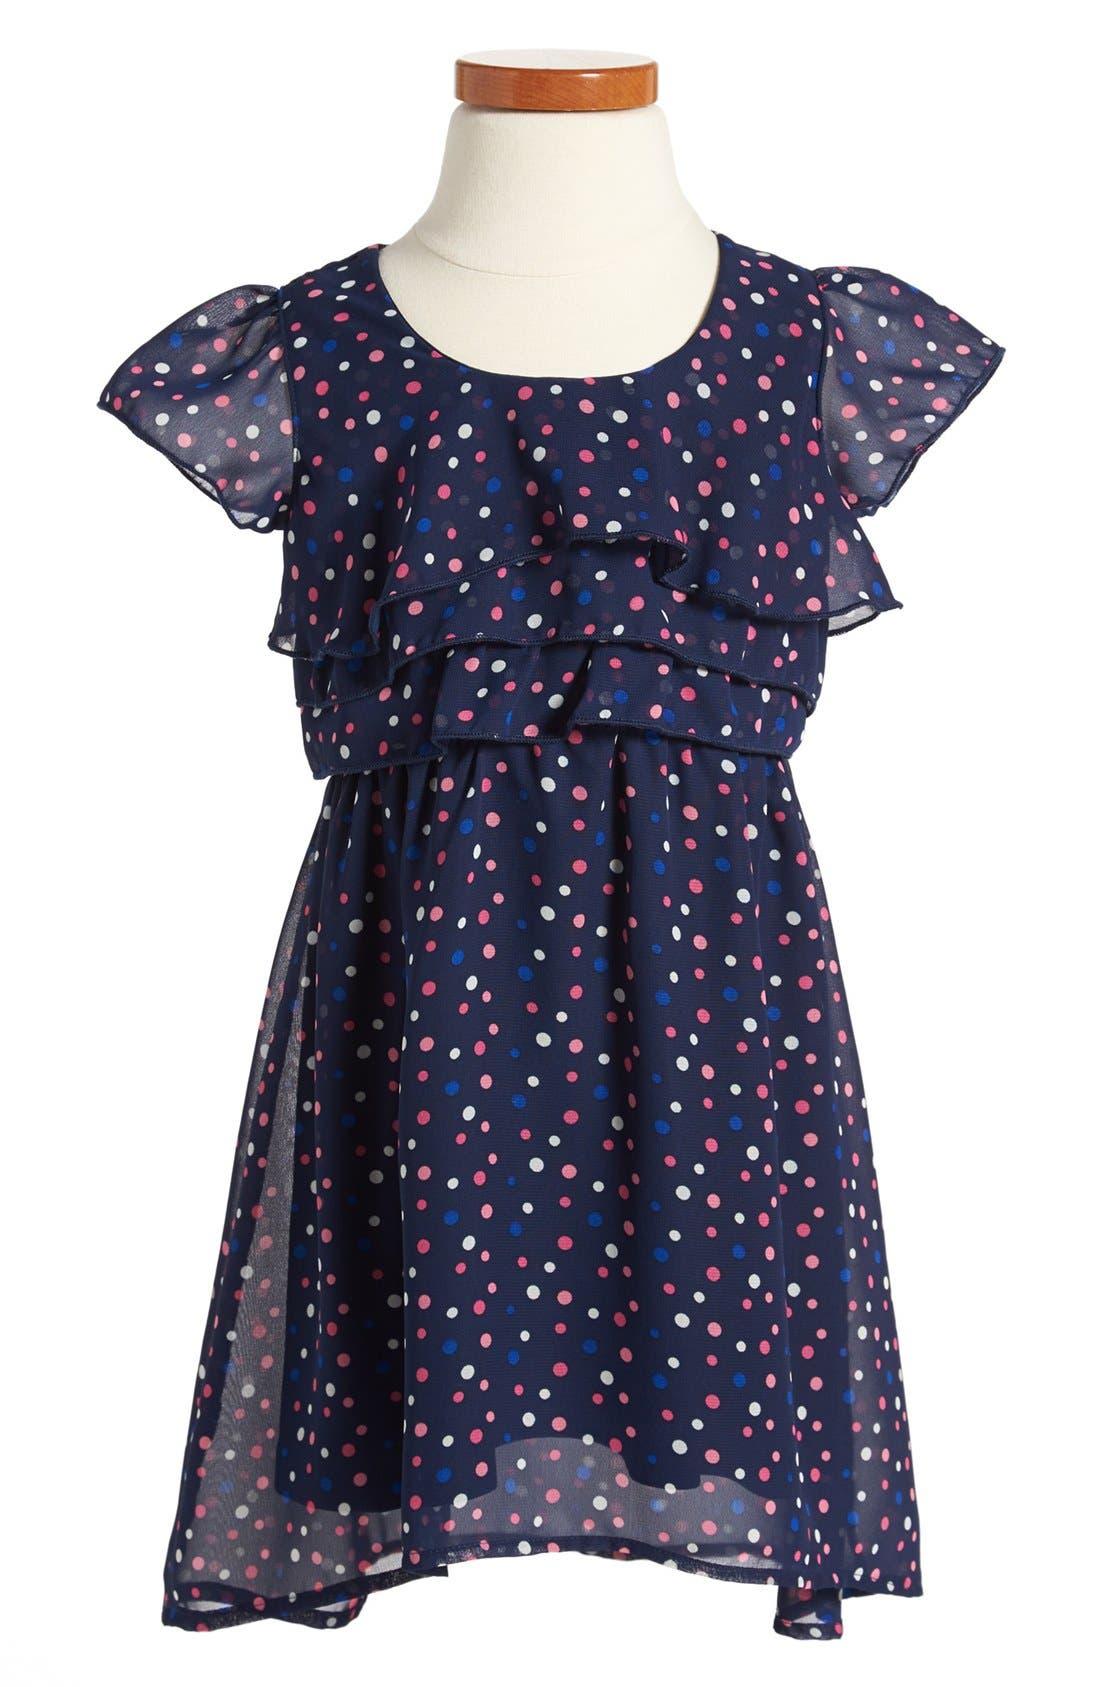 Main Image - Weavers Polka Dot Chiffon Dress (Toddler Girls)